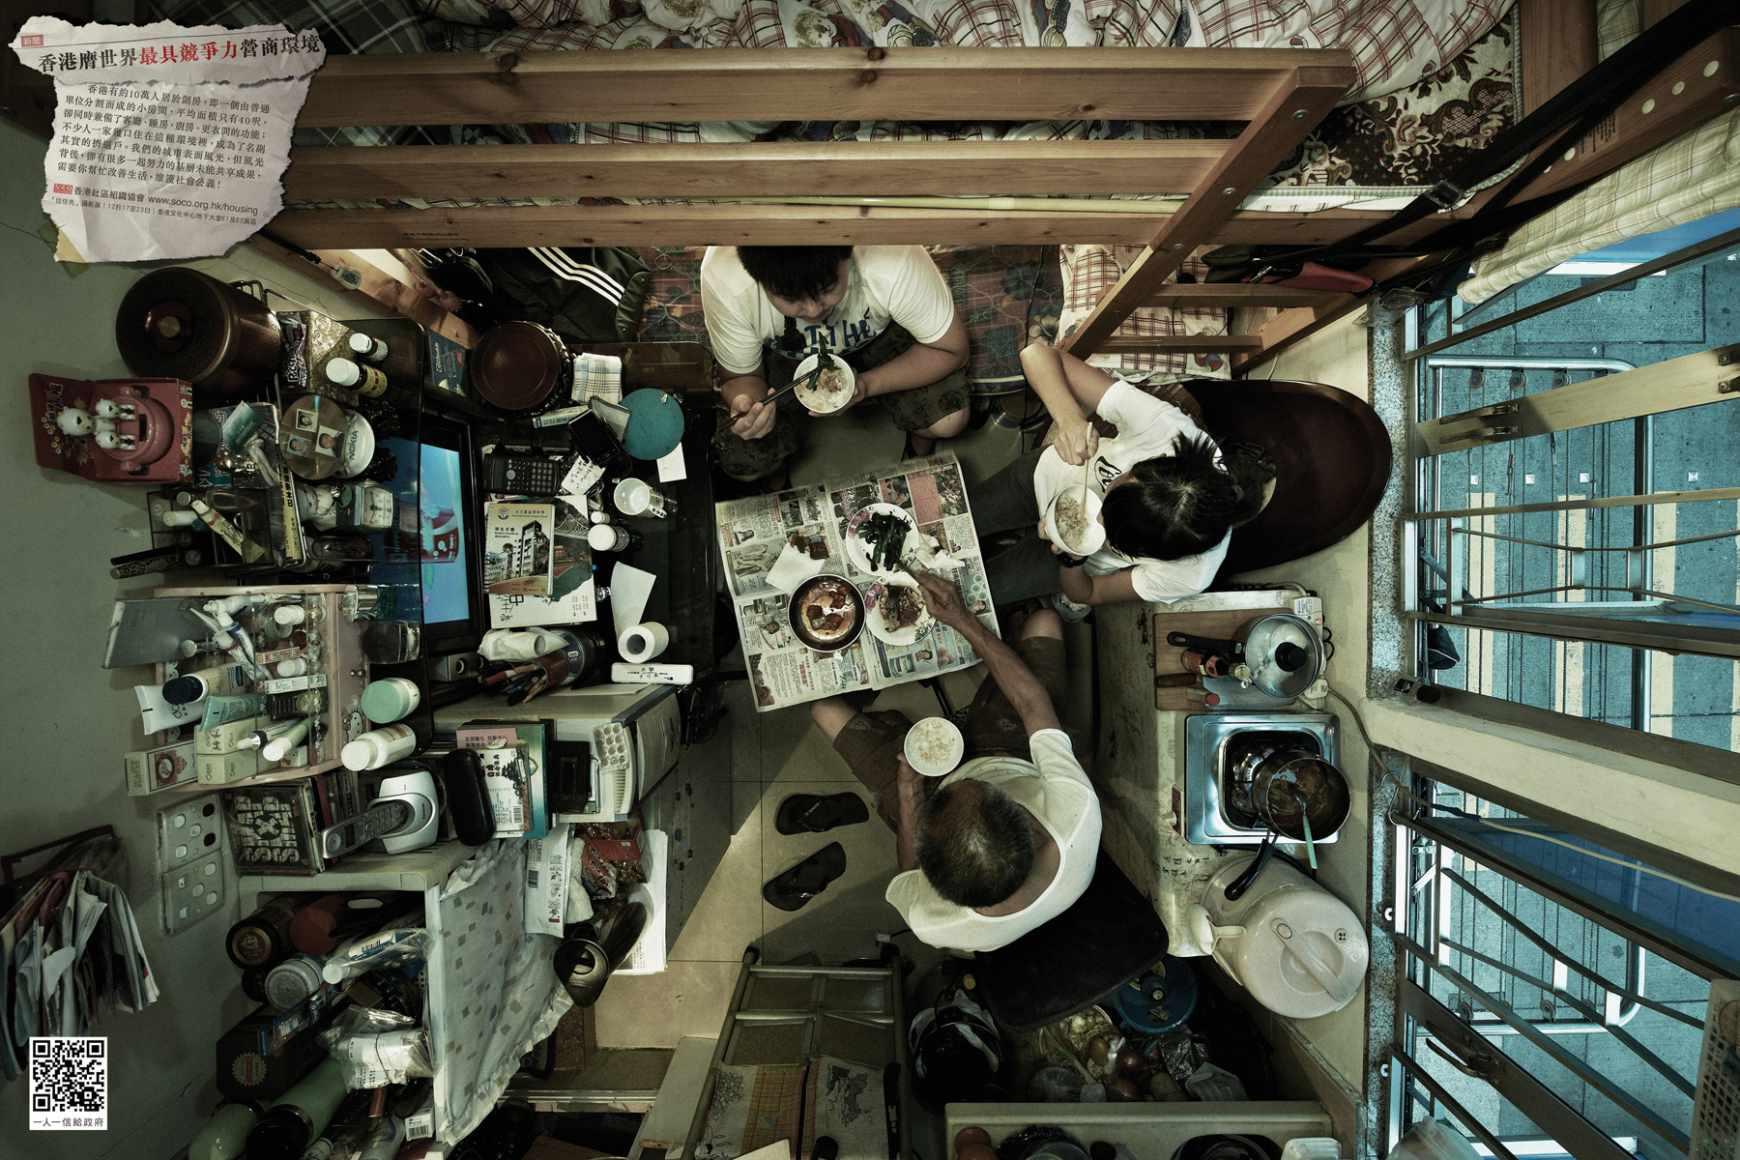 atrapados en as viven cientos de miles de personas en hong kong fotos